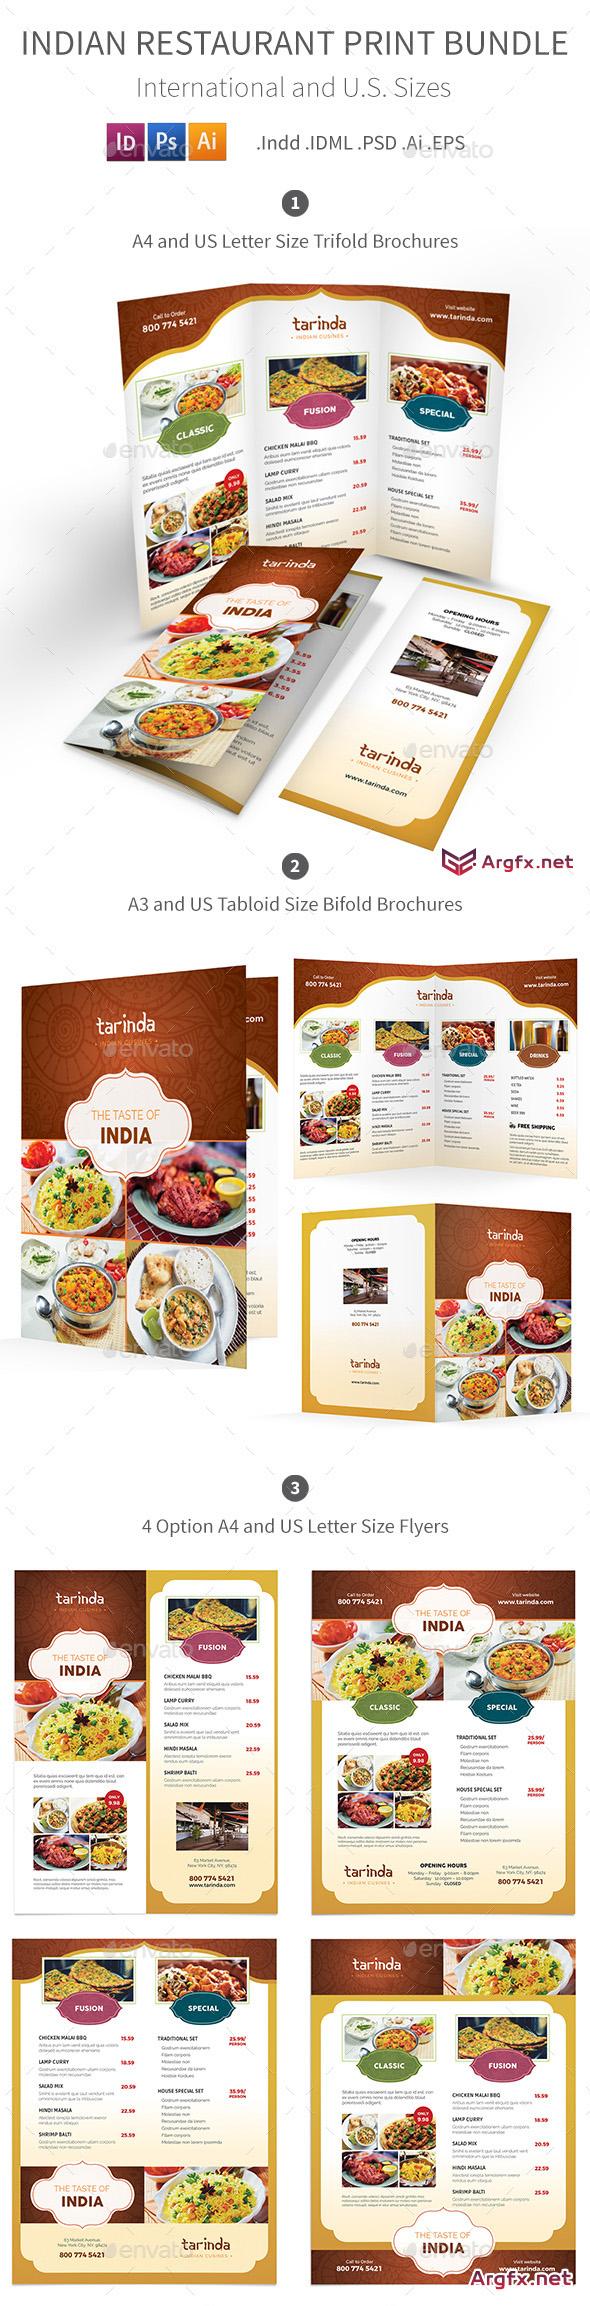 Indian Restaurant Menu Print Bundle - 19289137